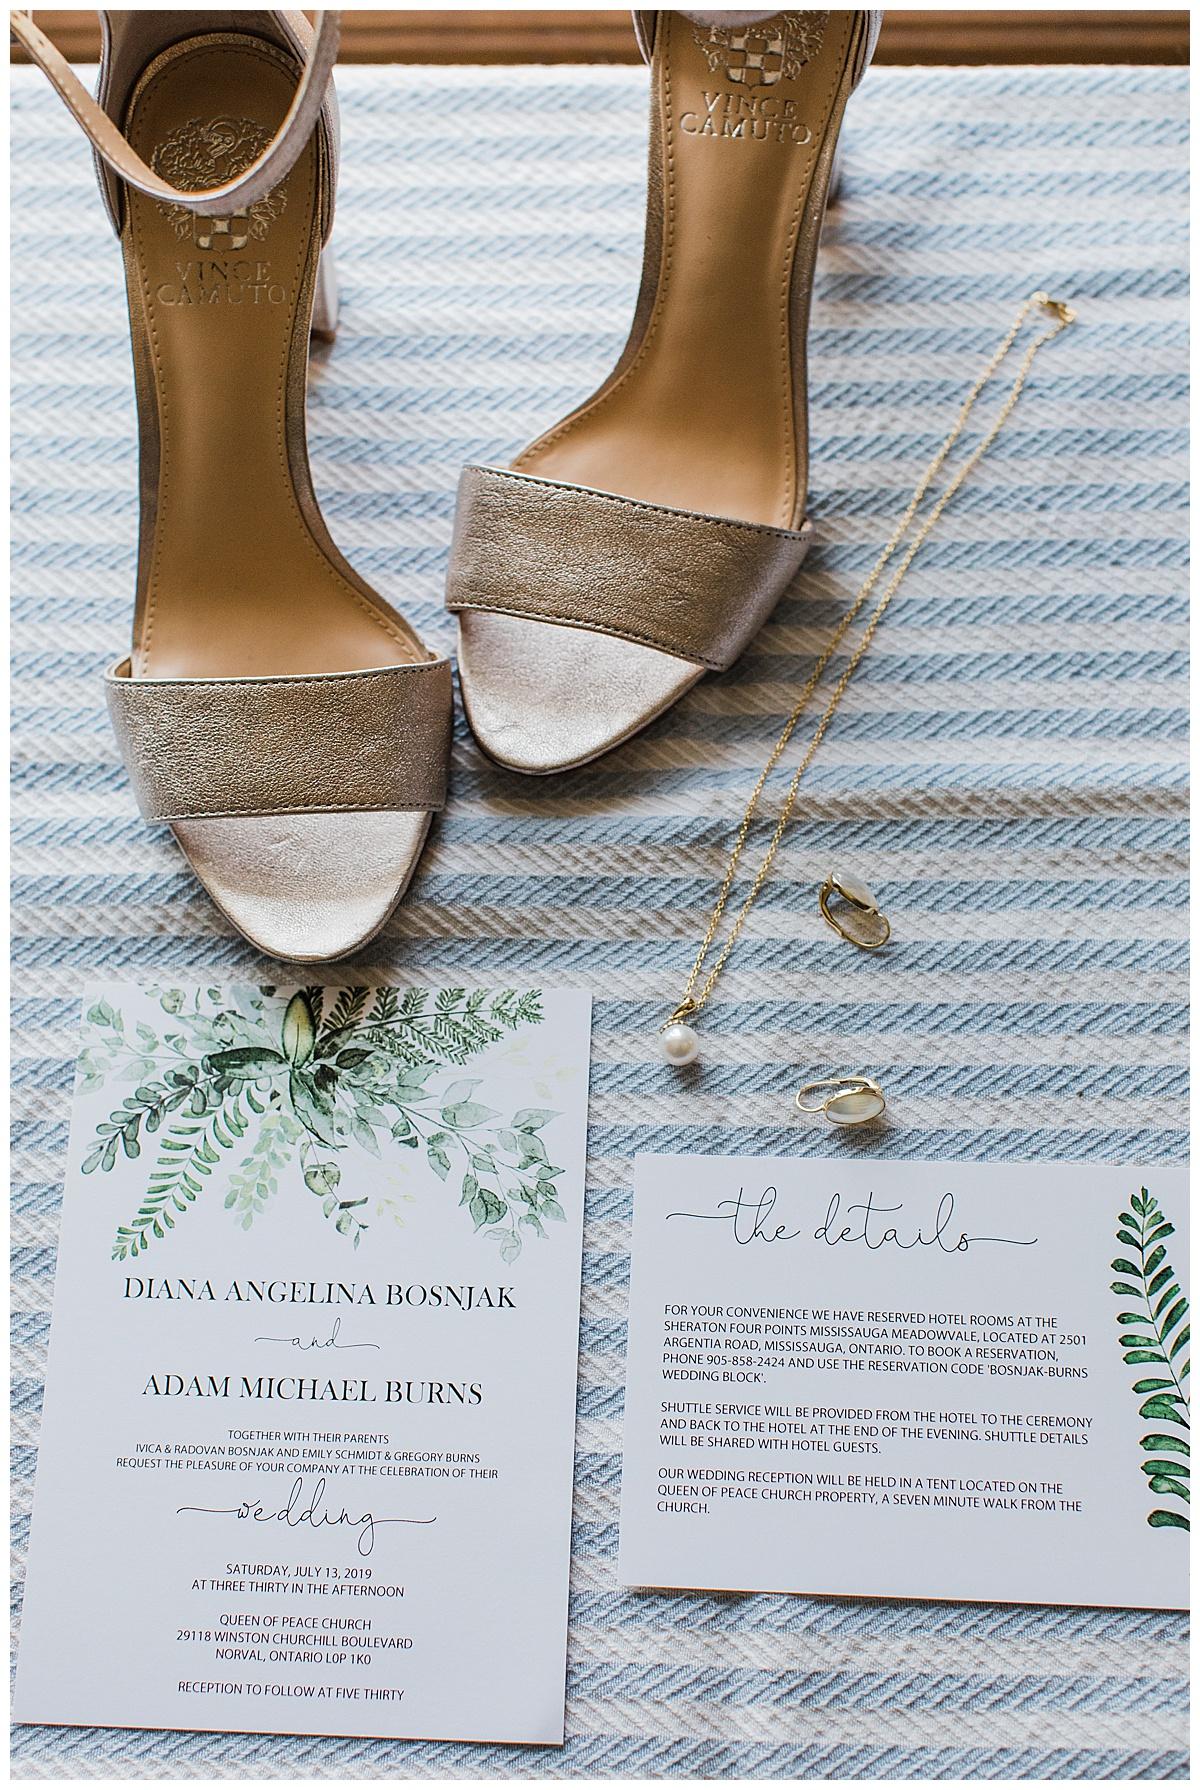 Gold wedding shoes, wedding invitations and bridal jewelry| Georgetown, Ontario Wedding| Toronto Wedding Photographer| 3photography